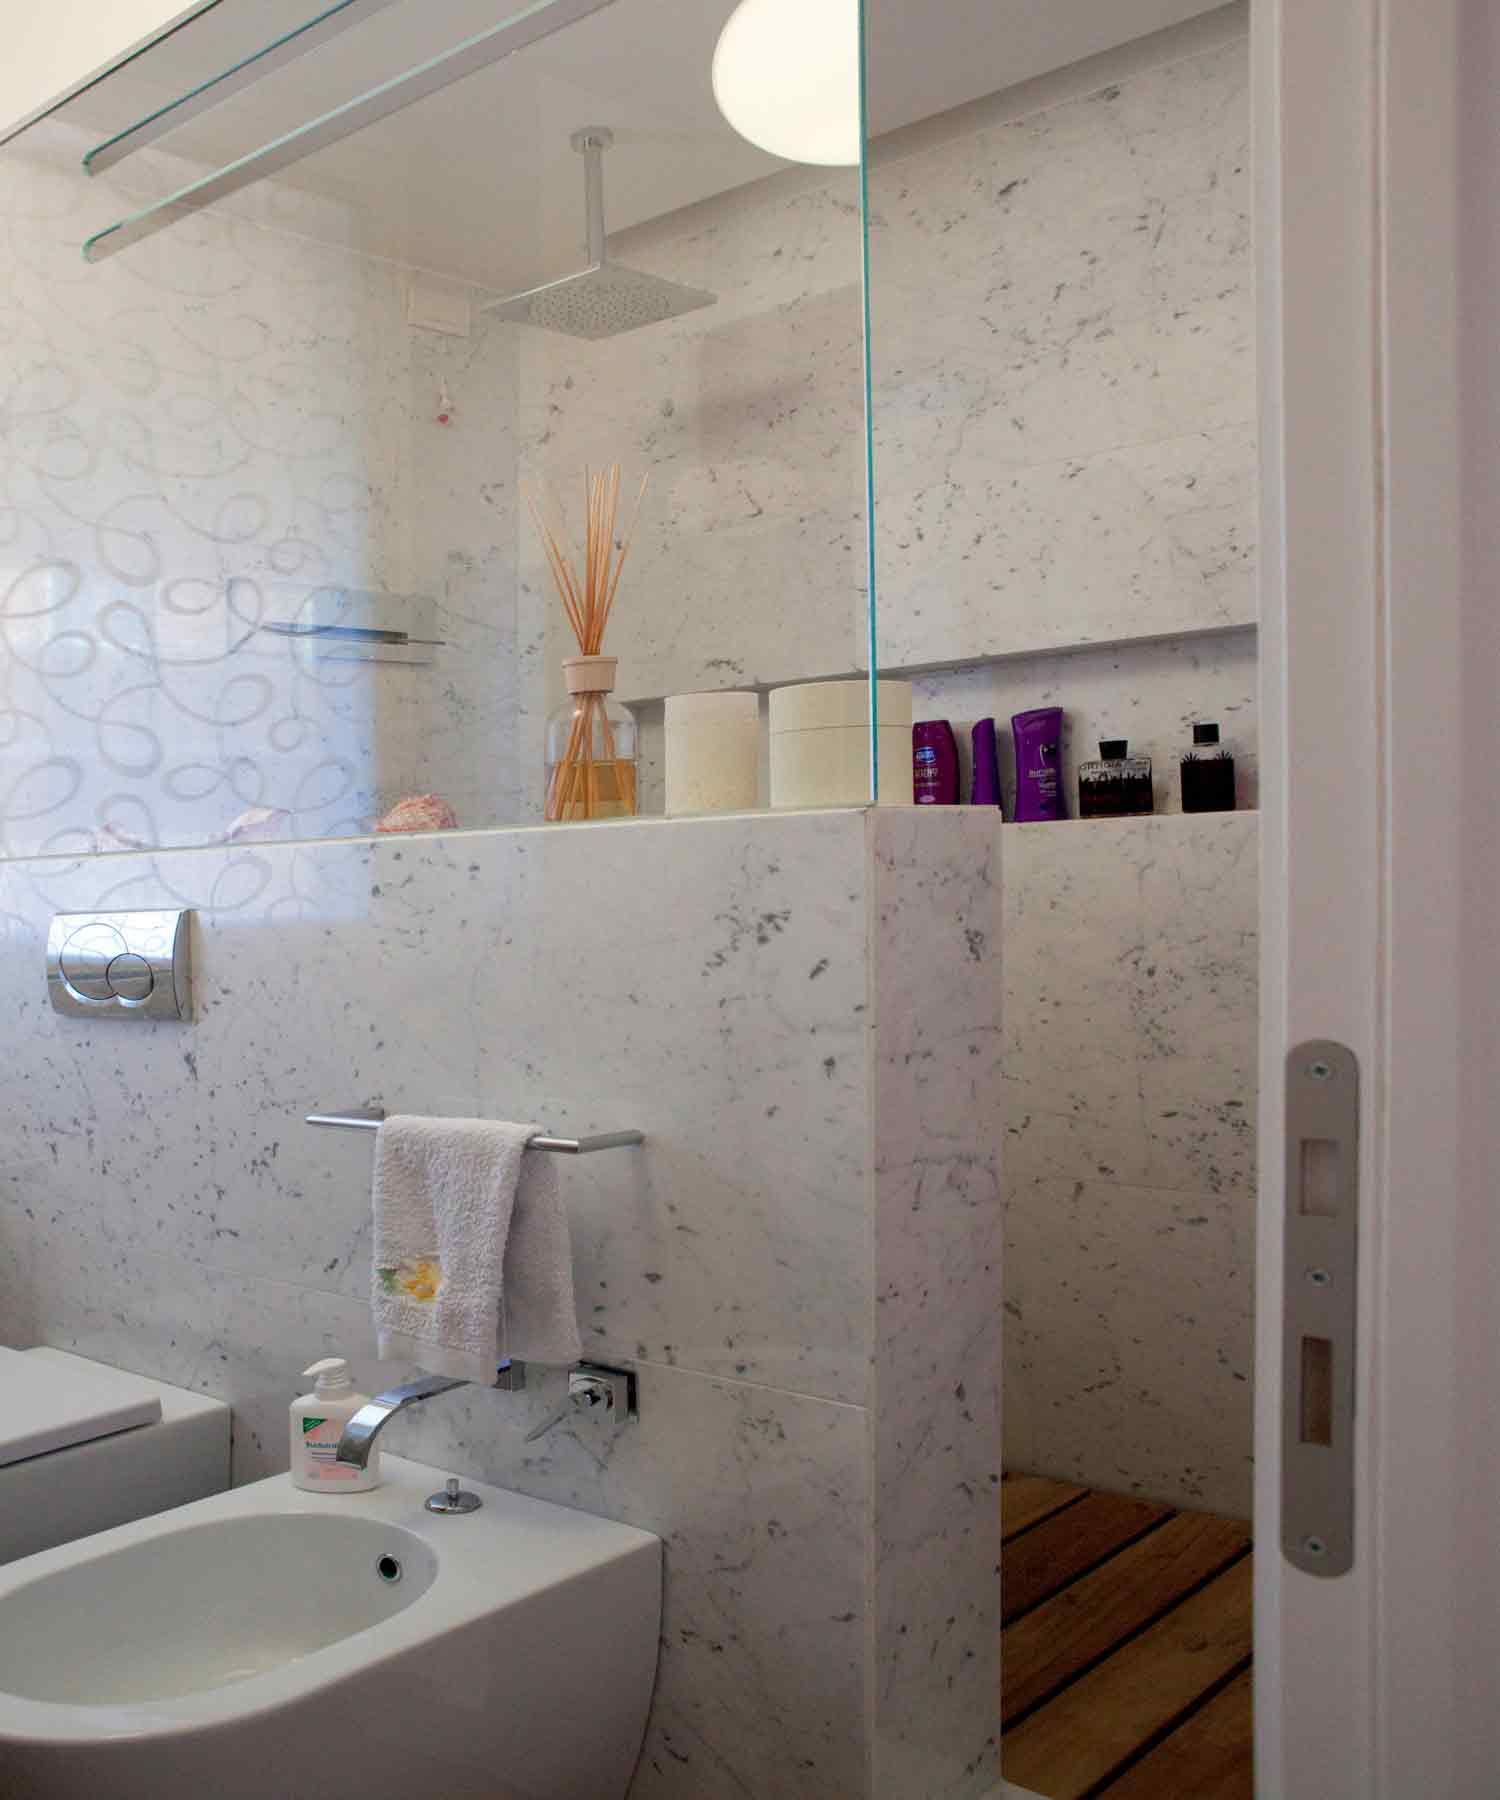 Legno marmo e ceramica giapponese bhc home experience for Pavimento giapponese